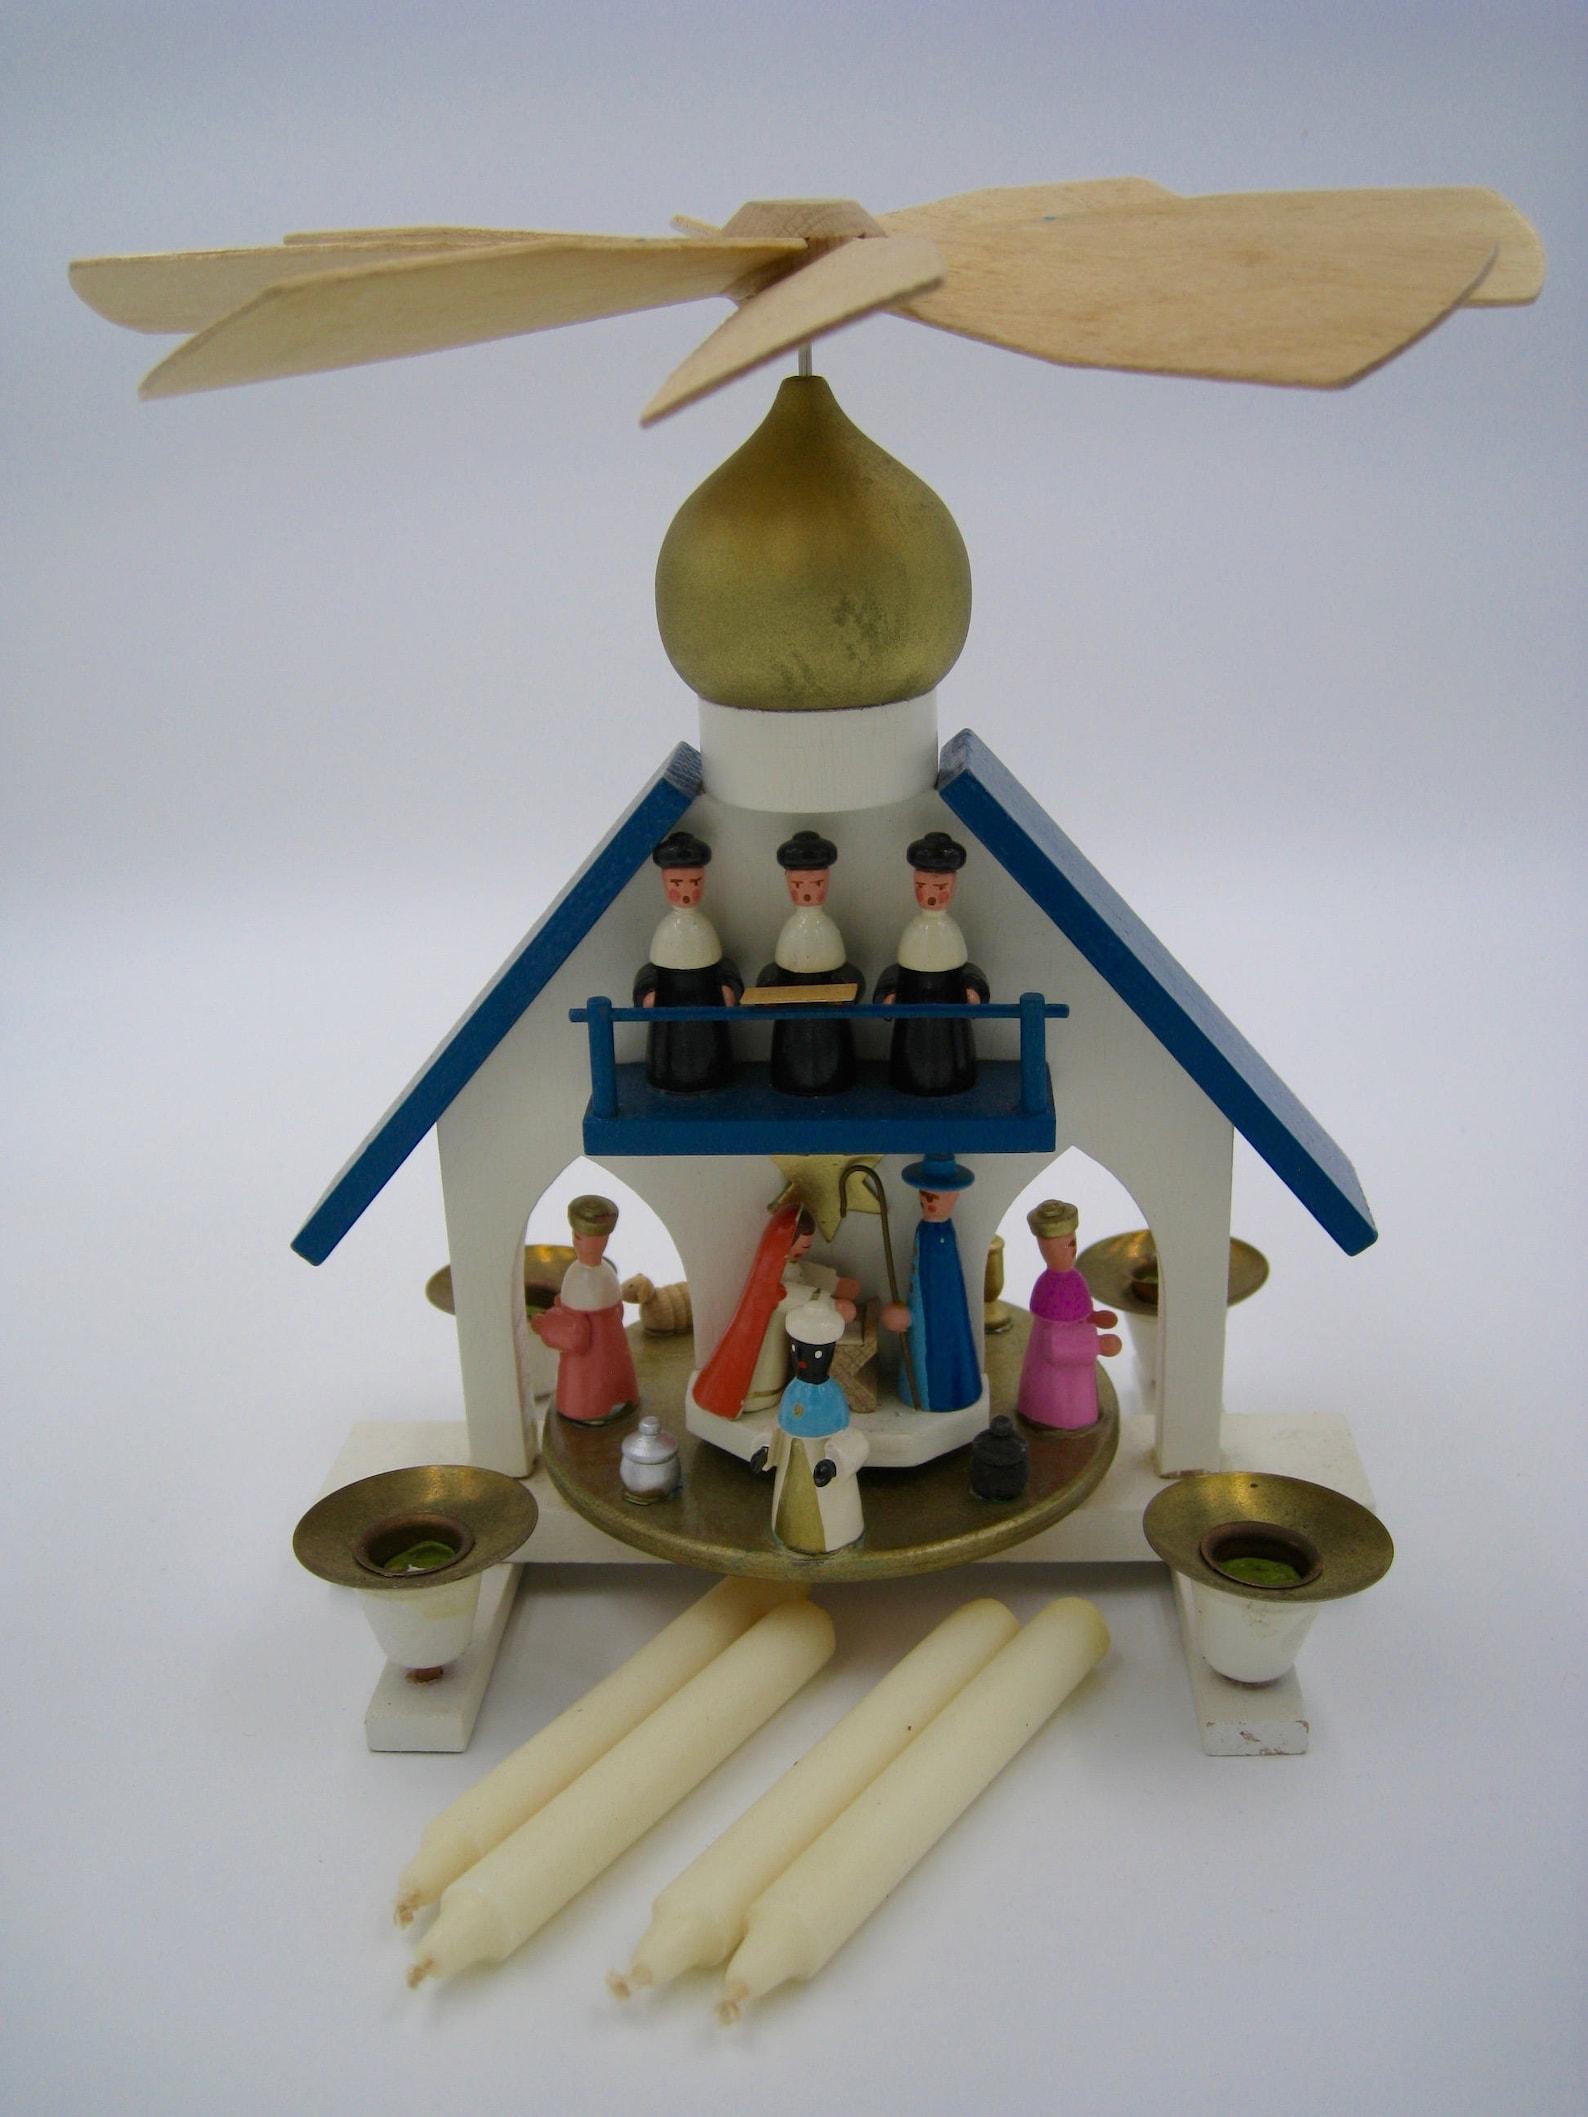 German Erzgebirge Wooden Pyramid, Candle-powered, Jesus Birth scene